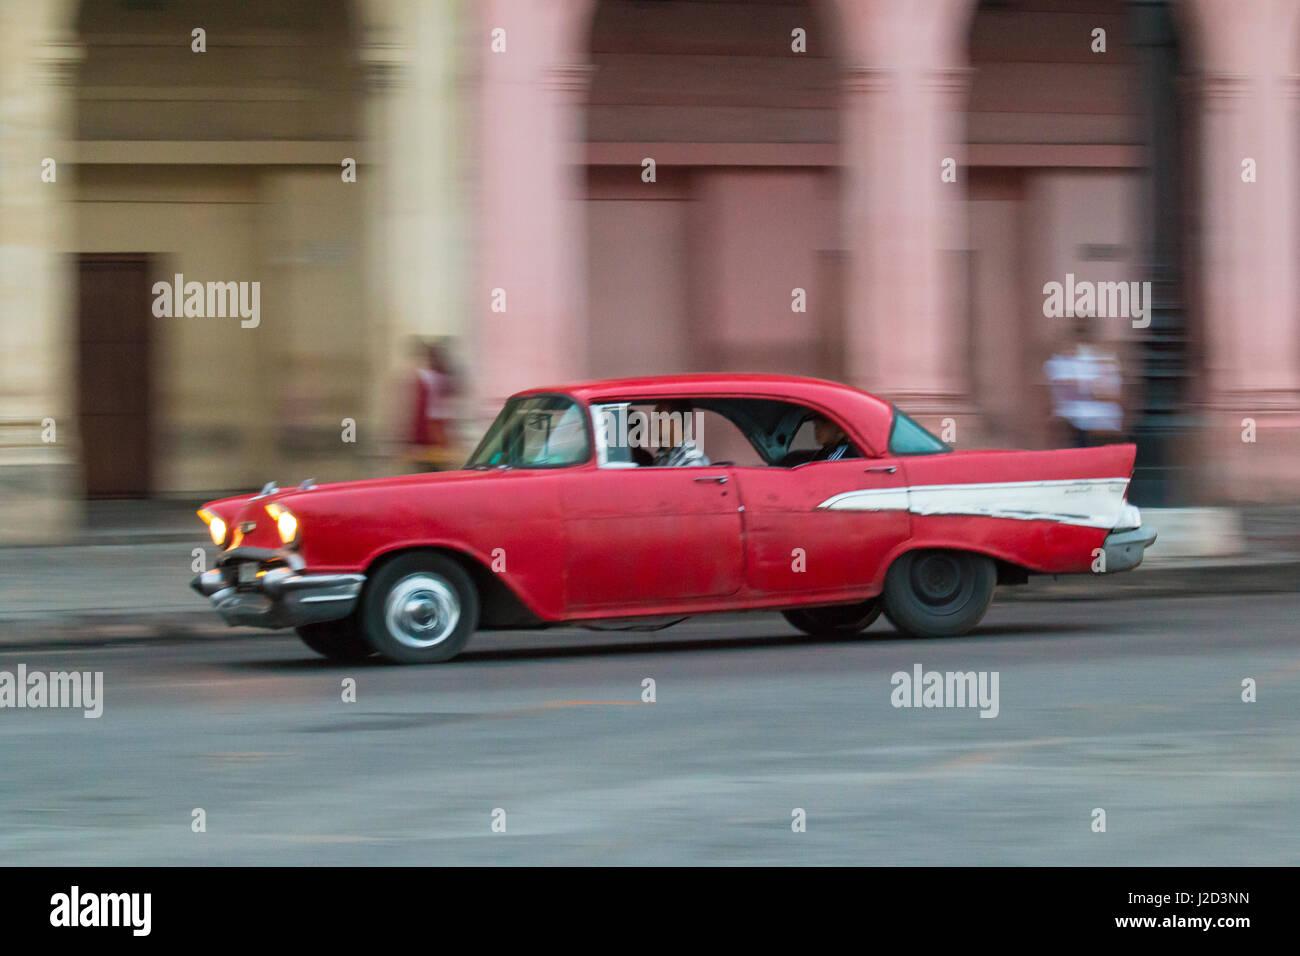 Caribbean, Cuba, Havana, collectible, vintage cars along Havana\'s ...